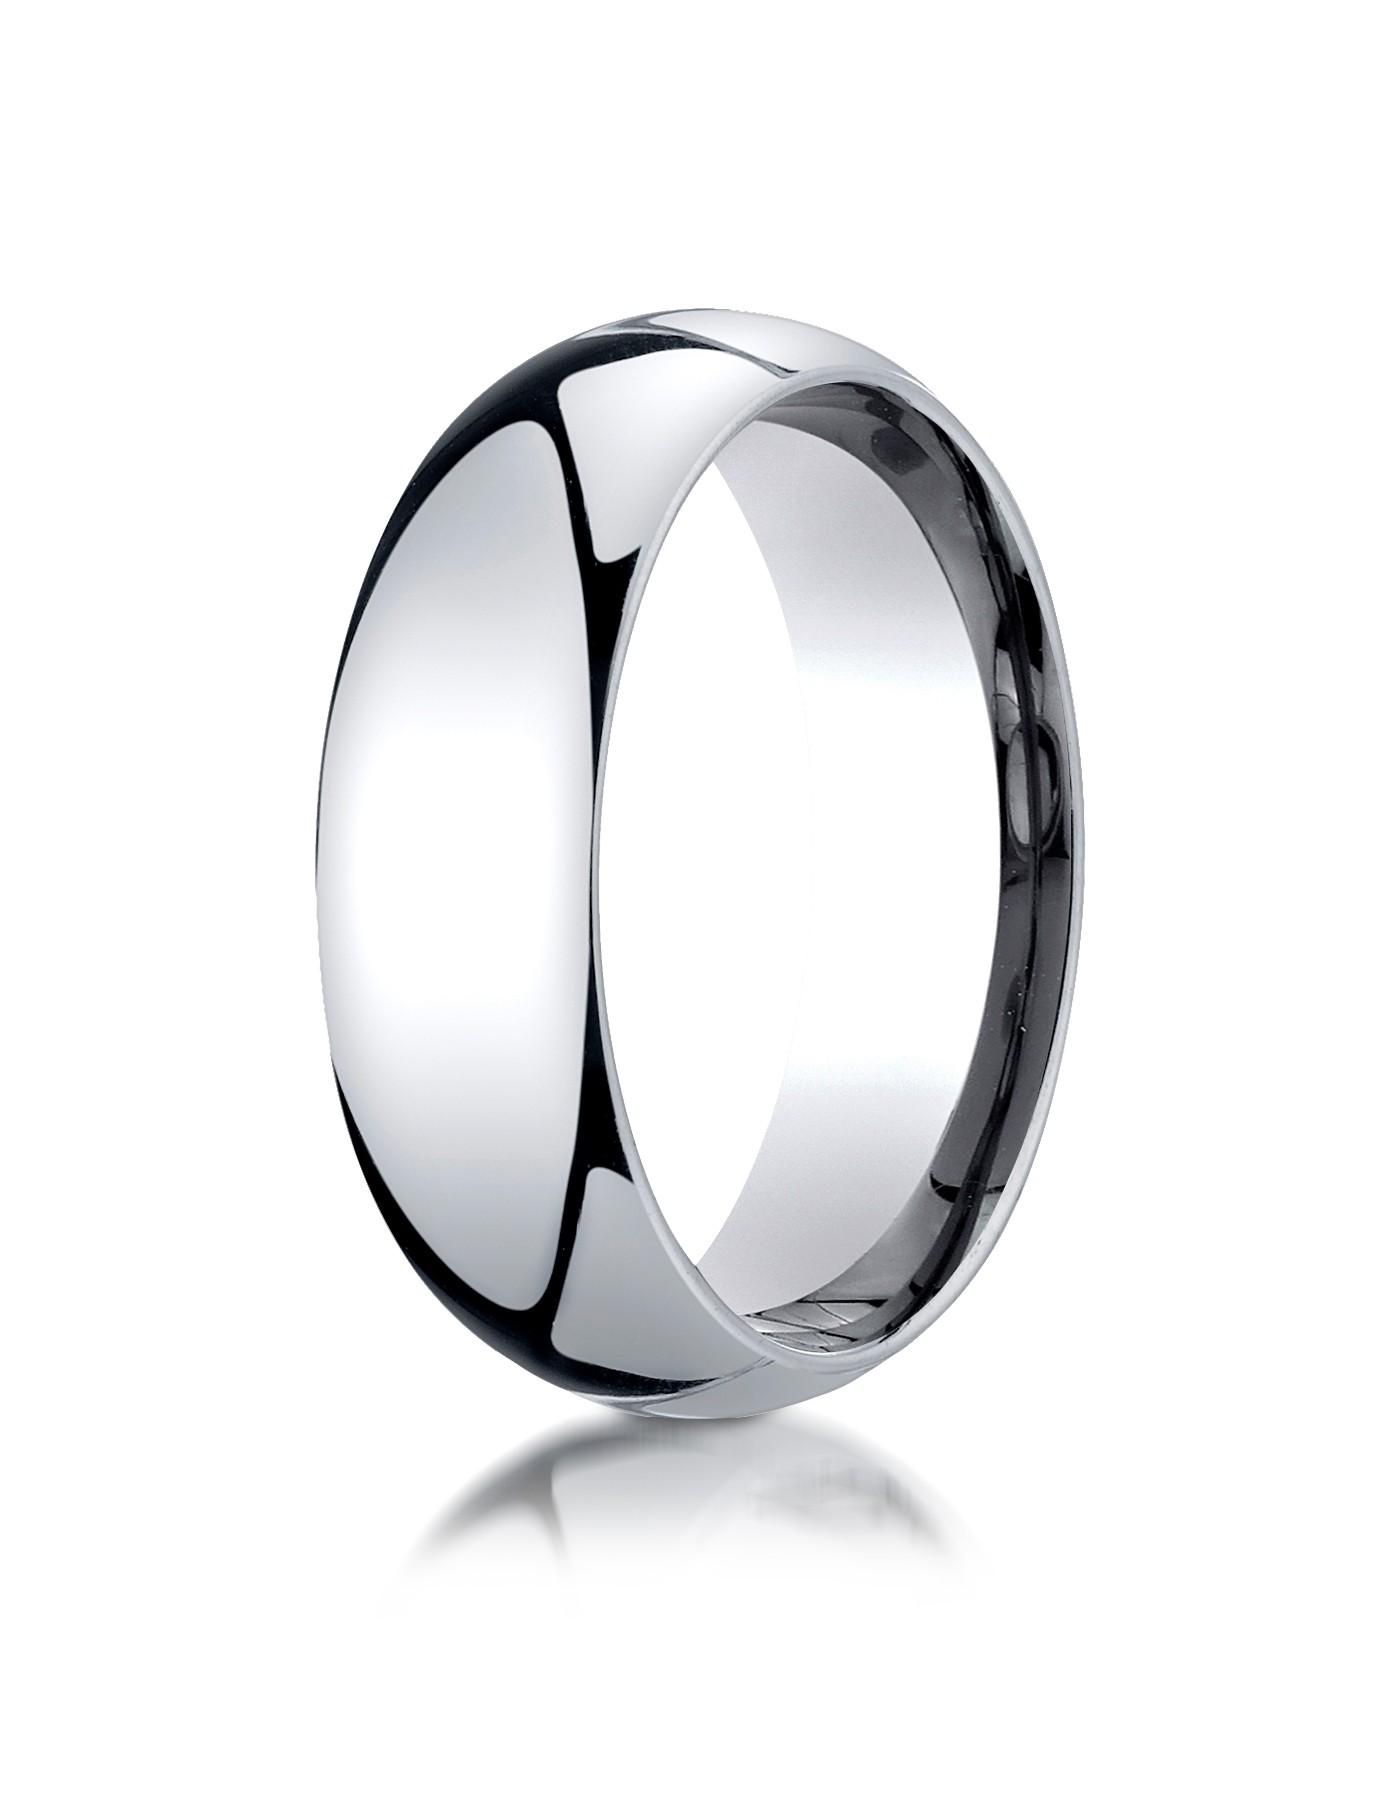 14k White Gold 7mm Slightly Domed Standard Comfort-fit Ring